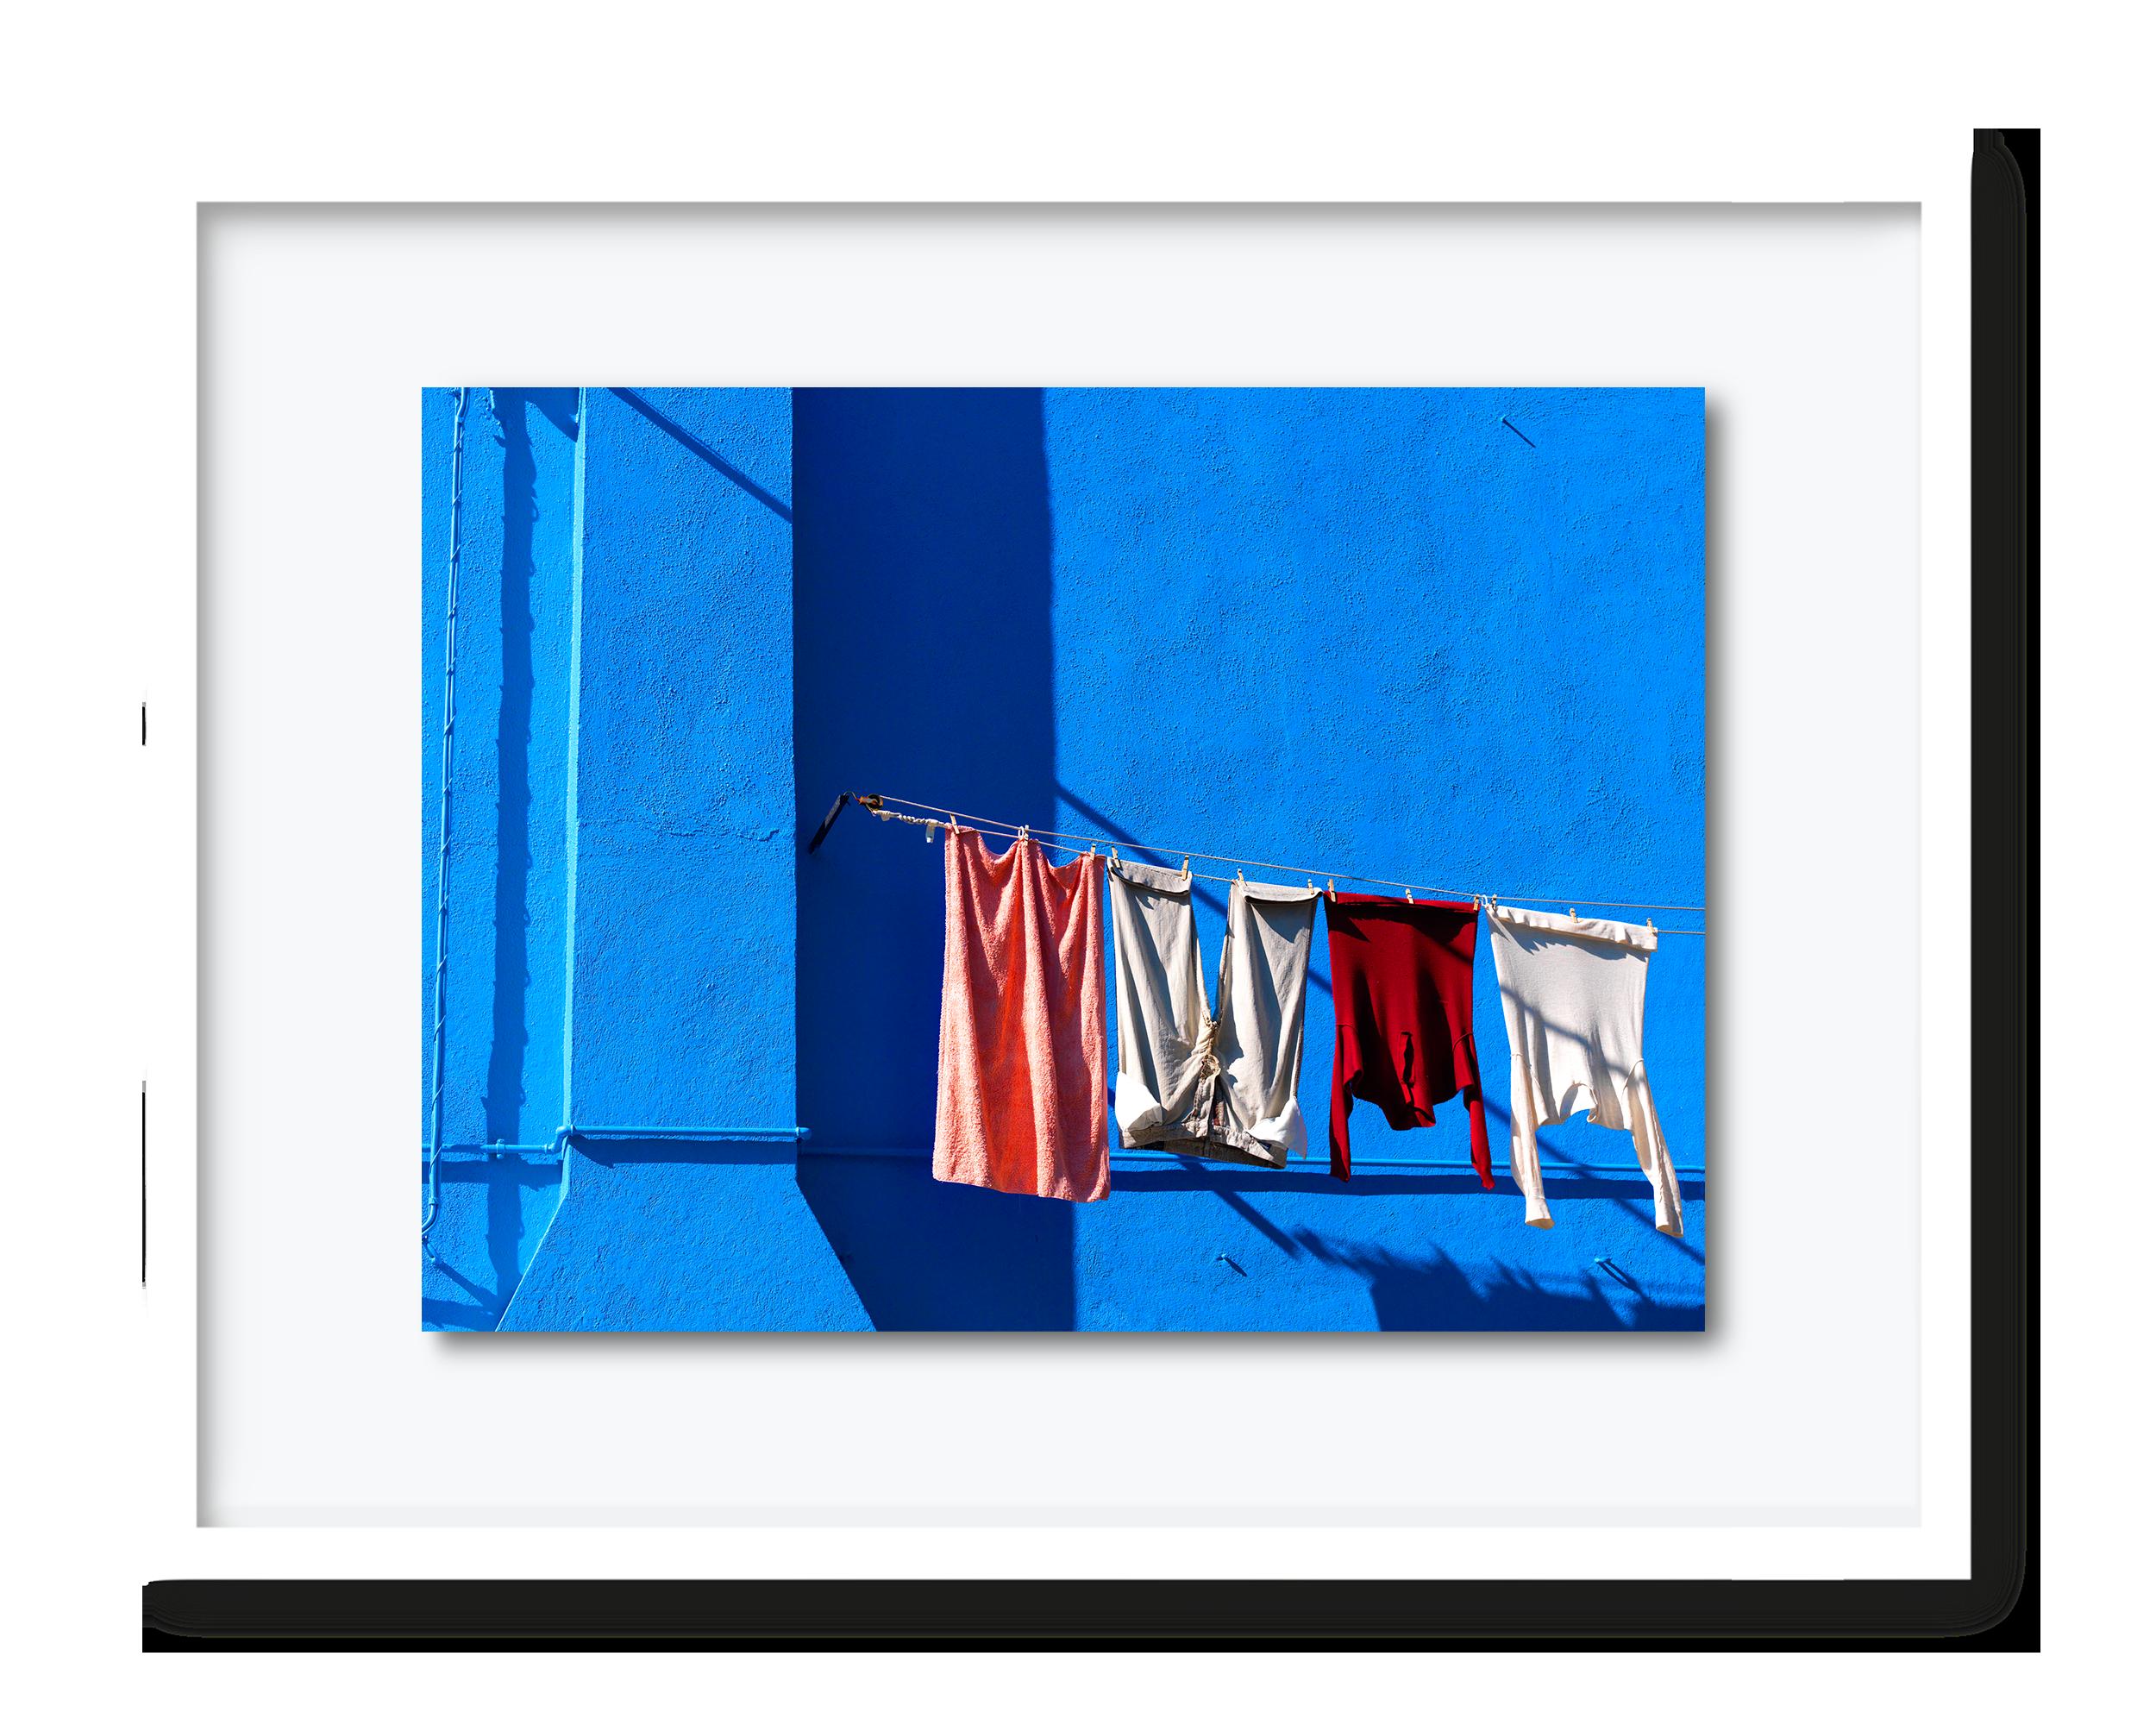 19.david-pearce-blue-building-venice.png